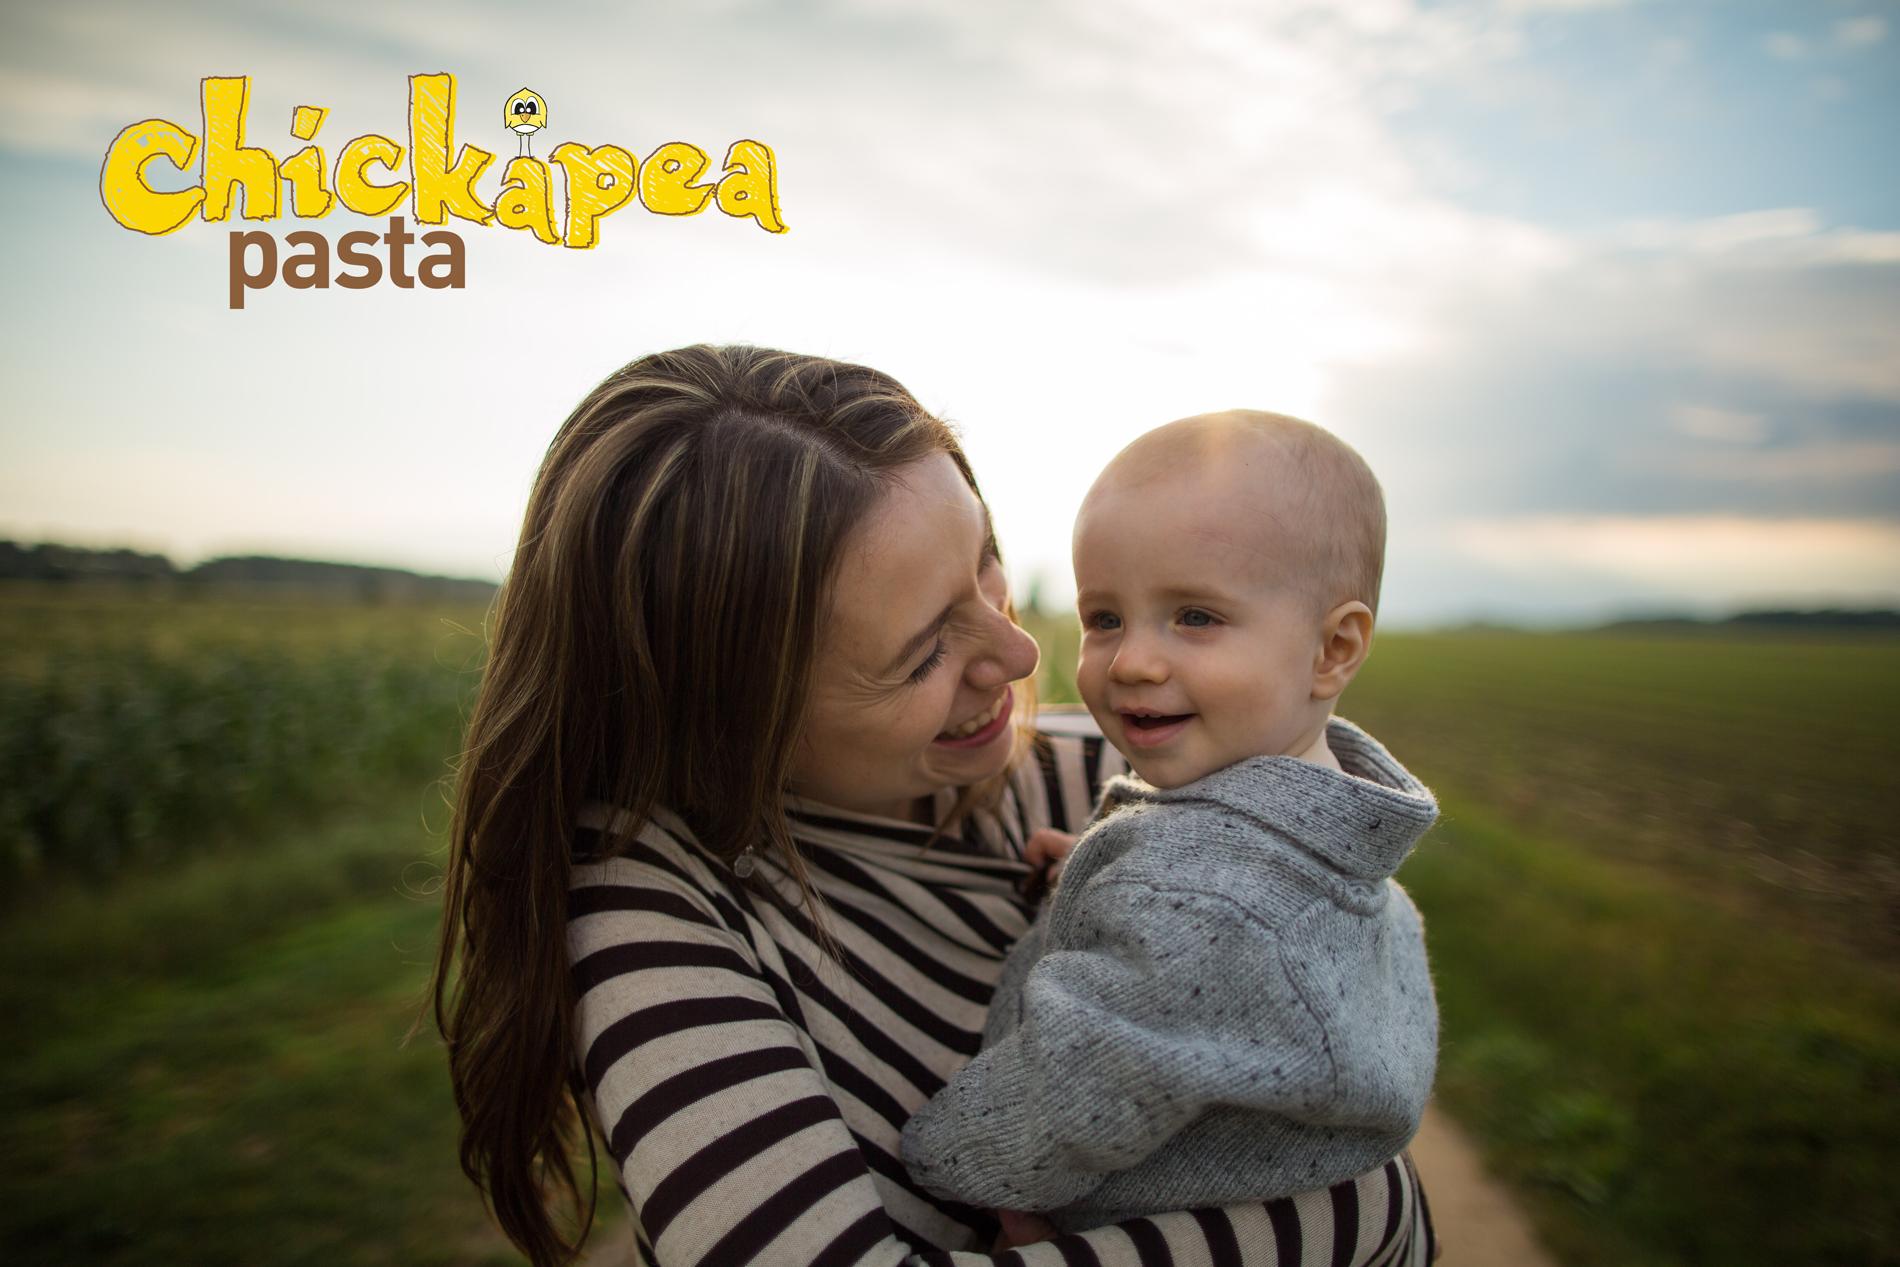 Announcing Chickapea Pasta